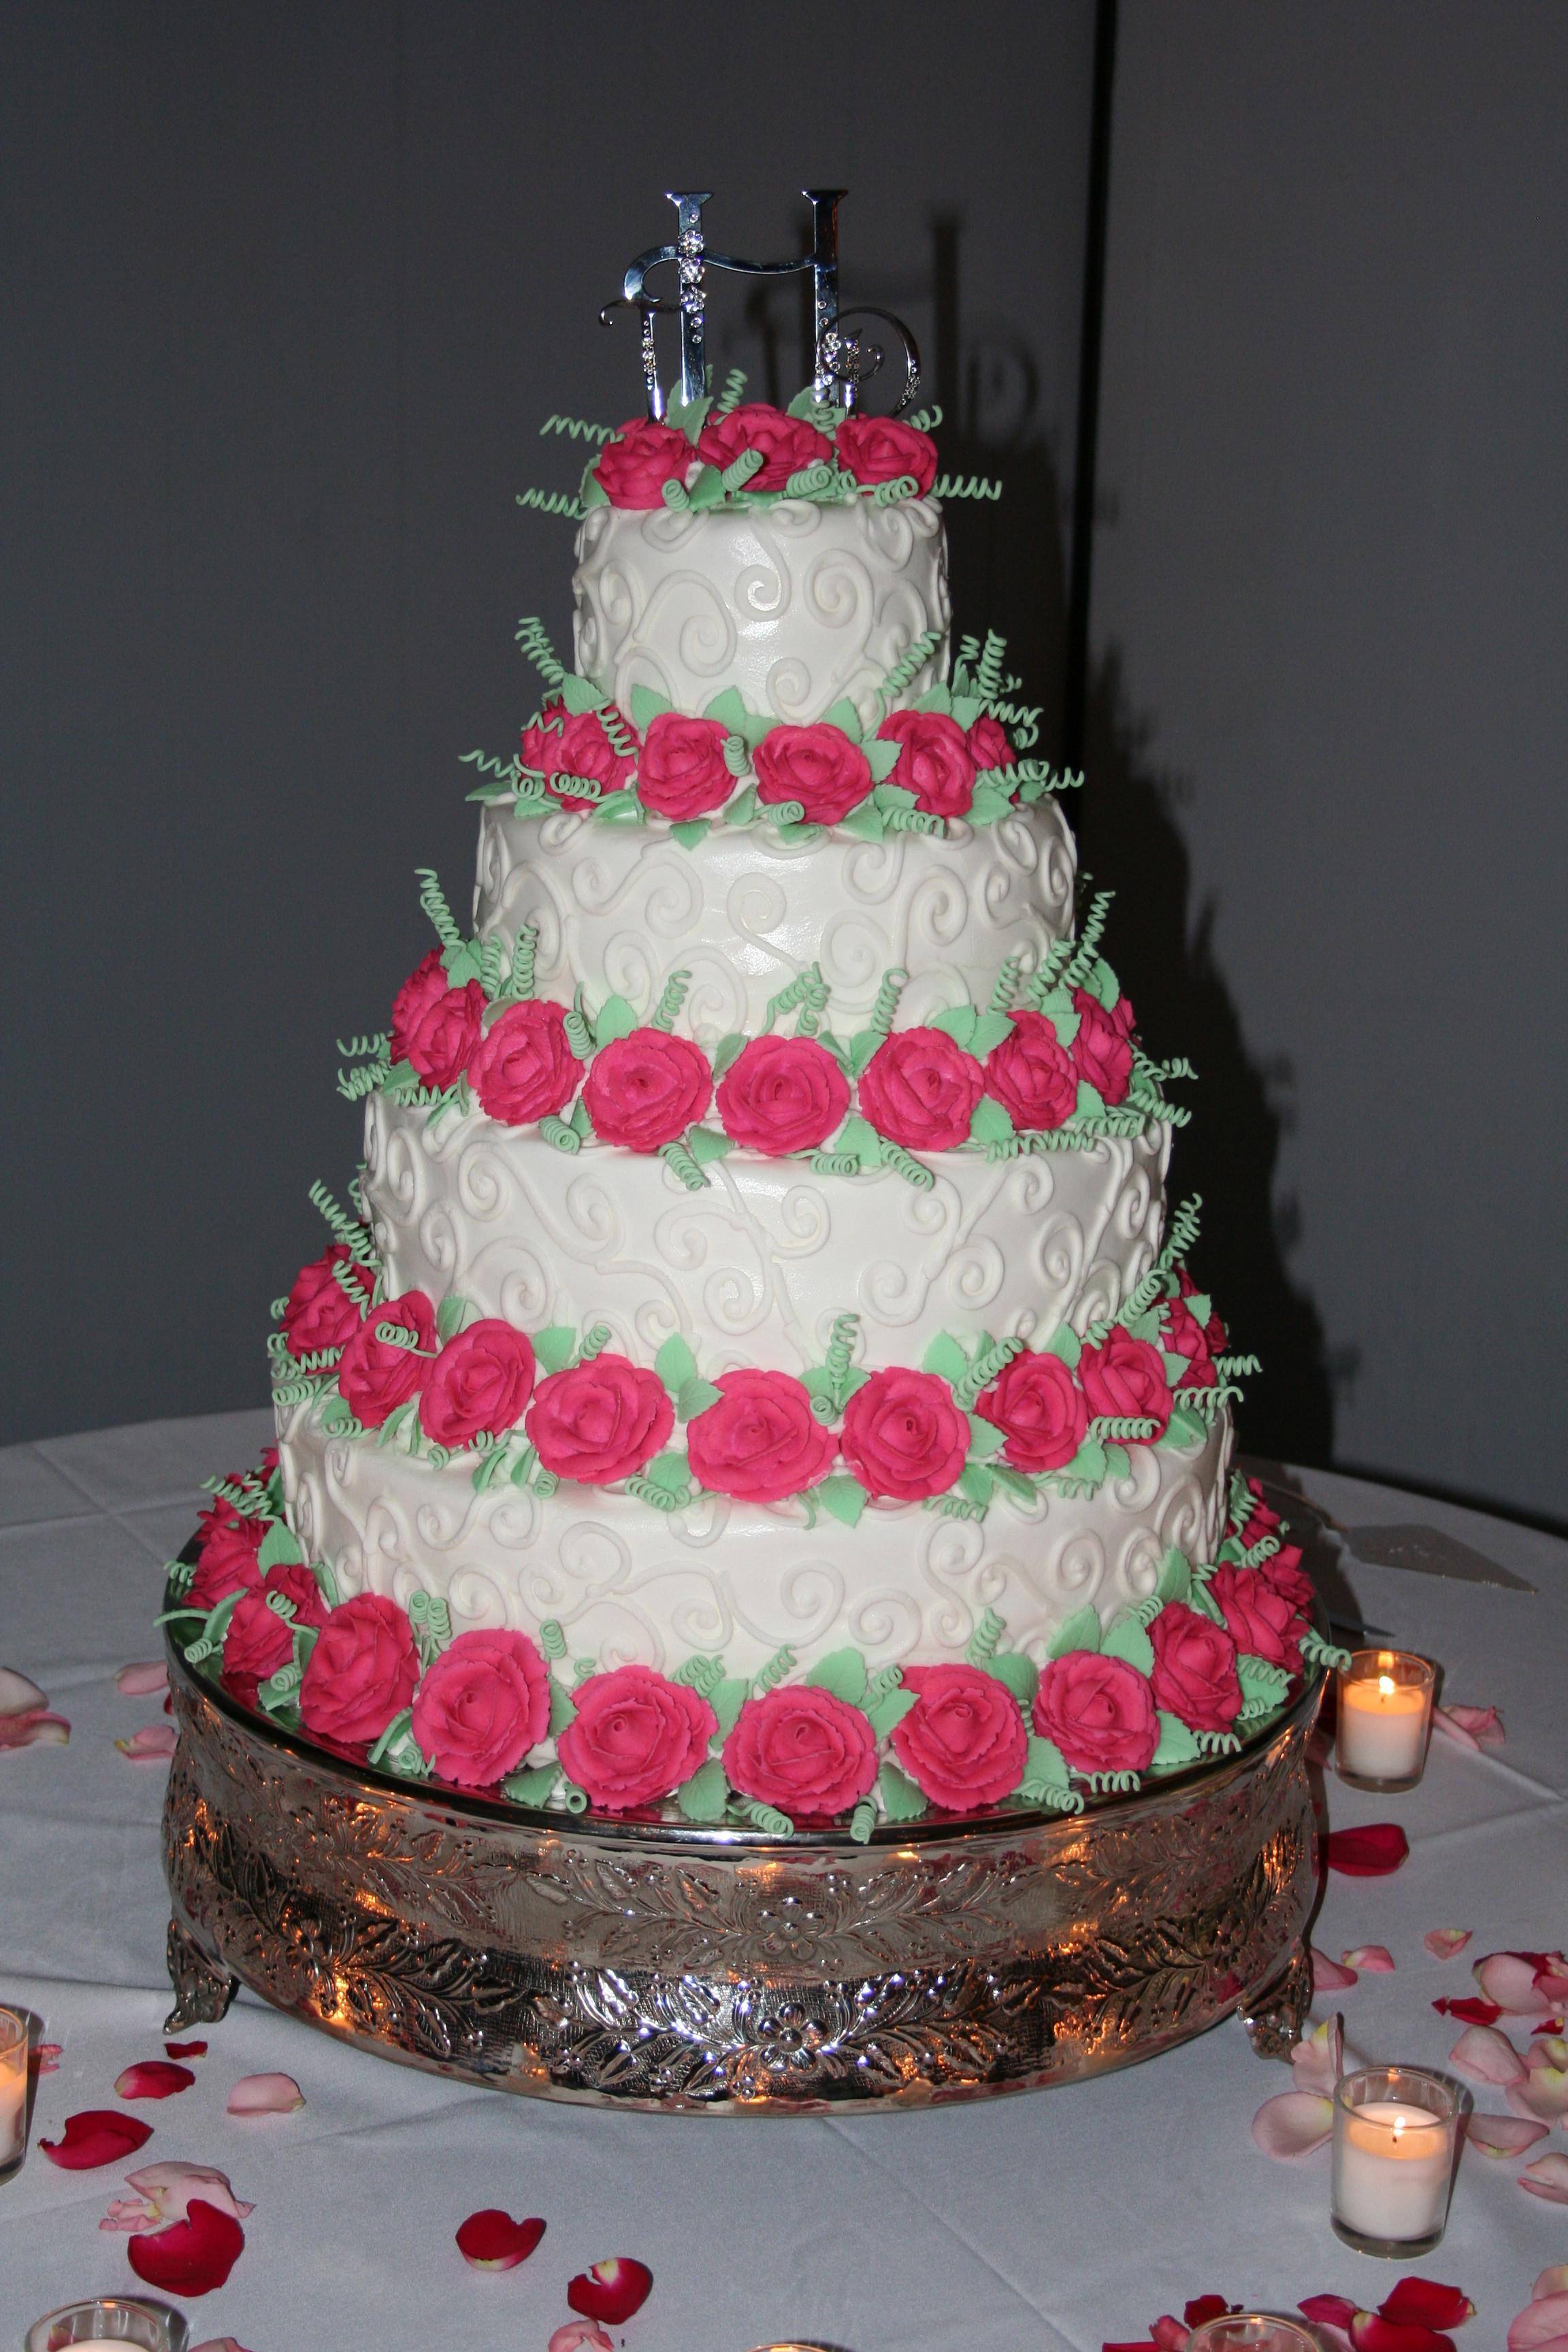 Walmart Wedding Cakes Cost  Walmart Wedding Cake Prices